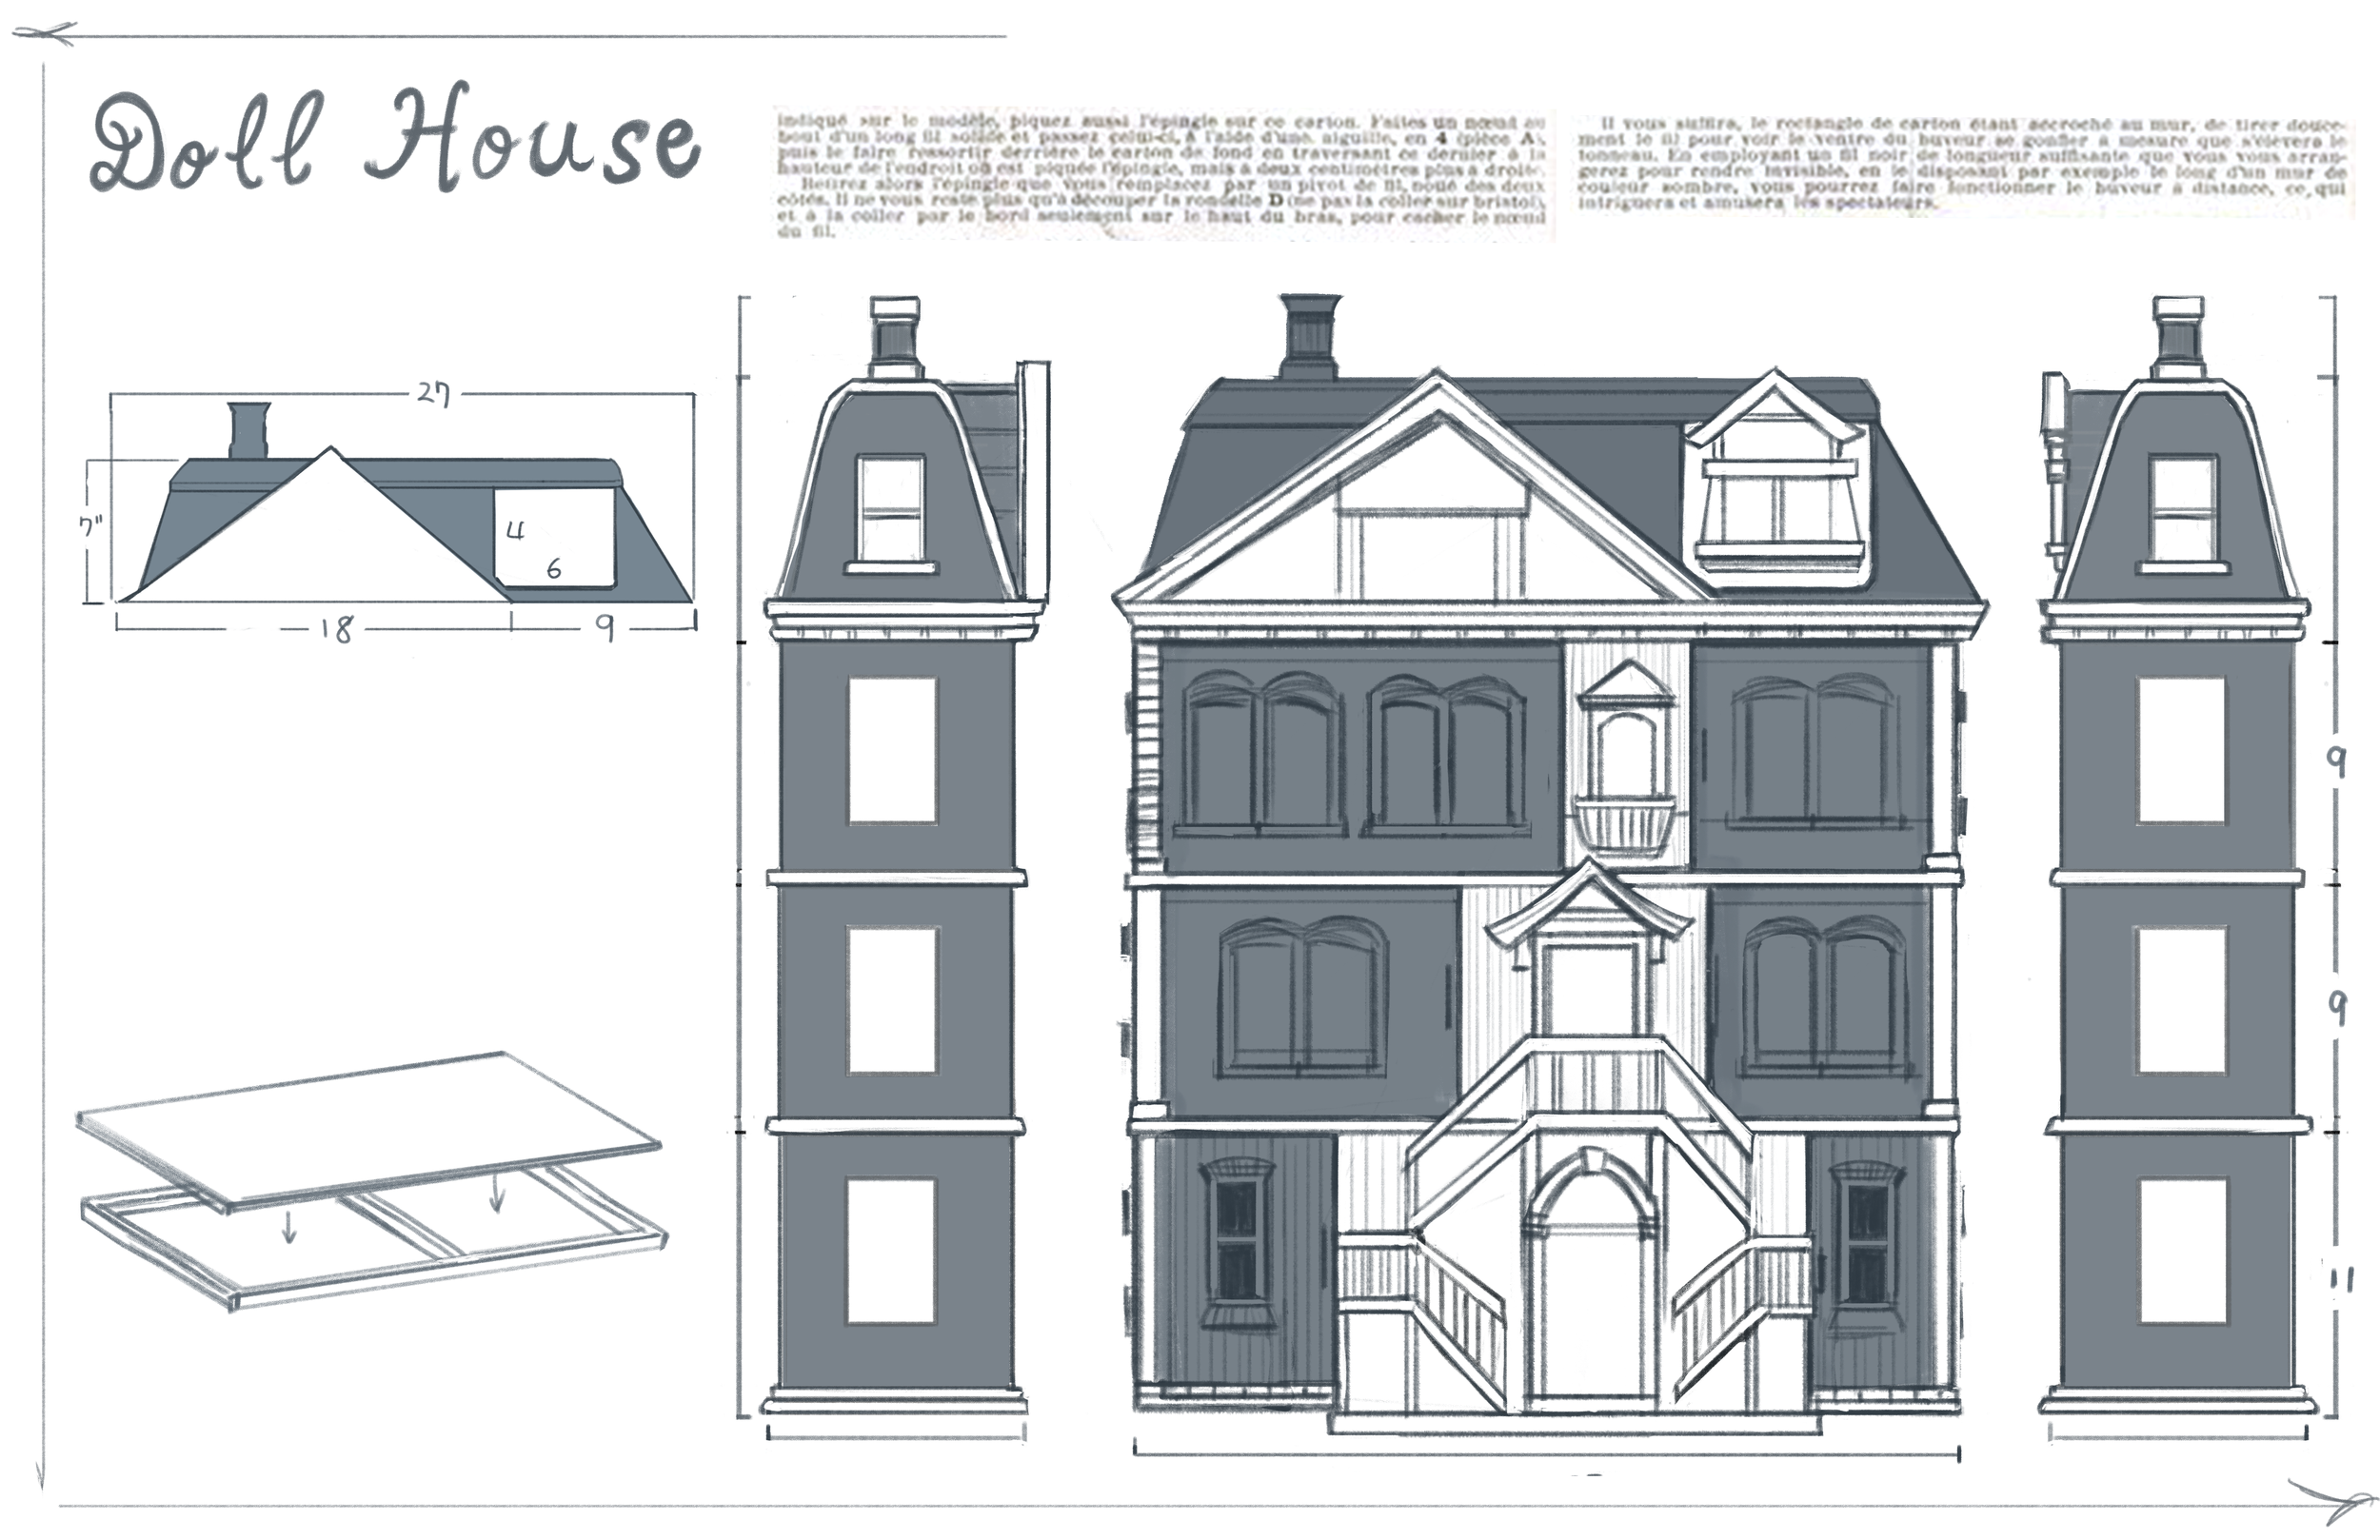 Dollhouse blueprint